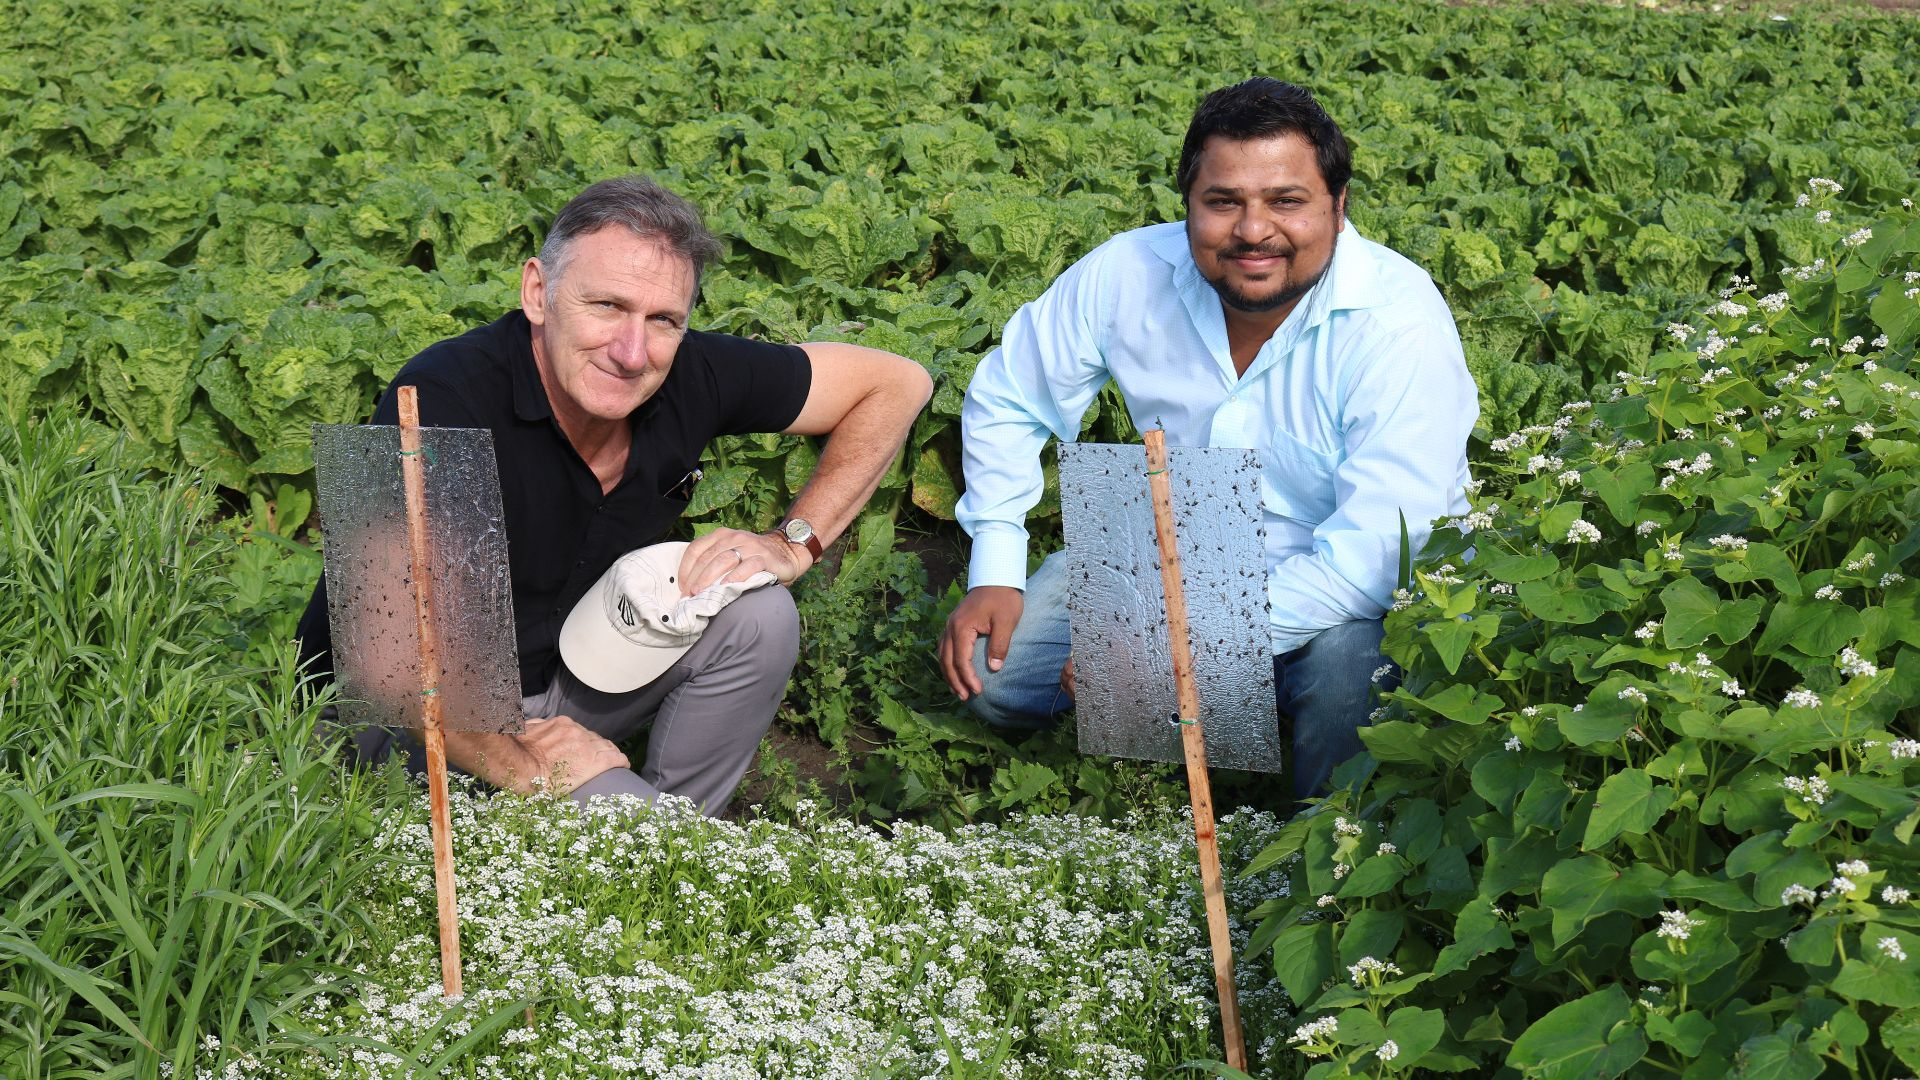 Flowering field trials to beat vegetable pests